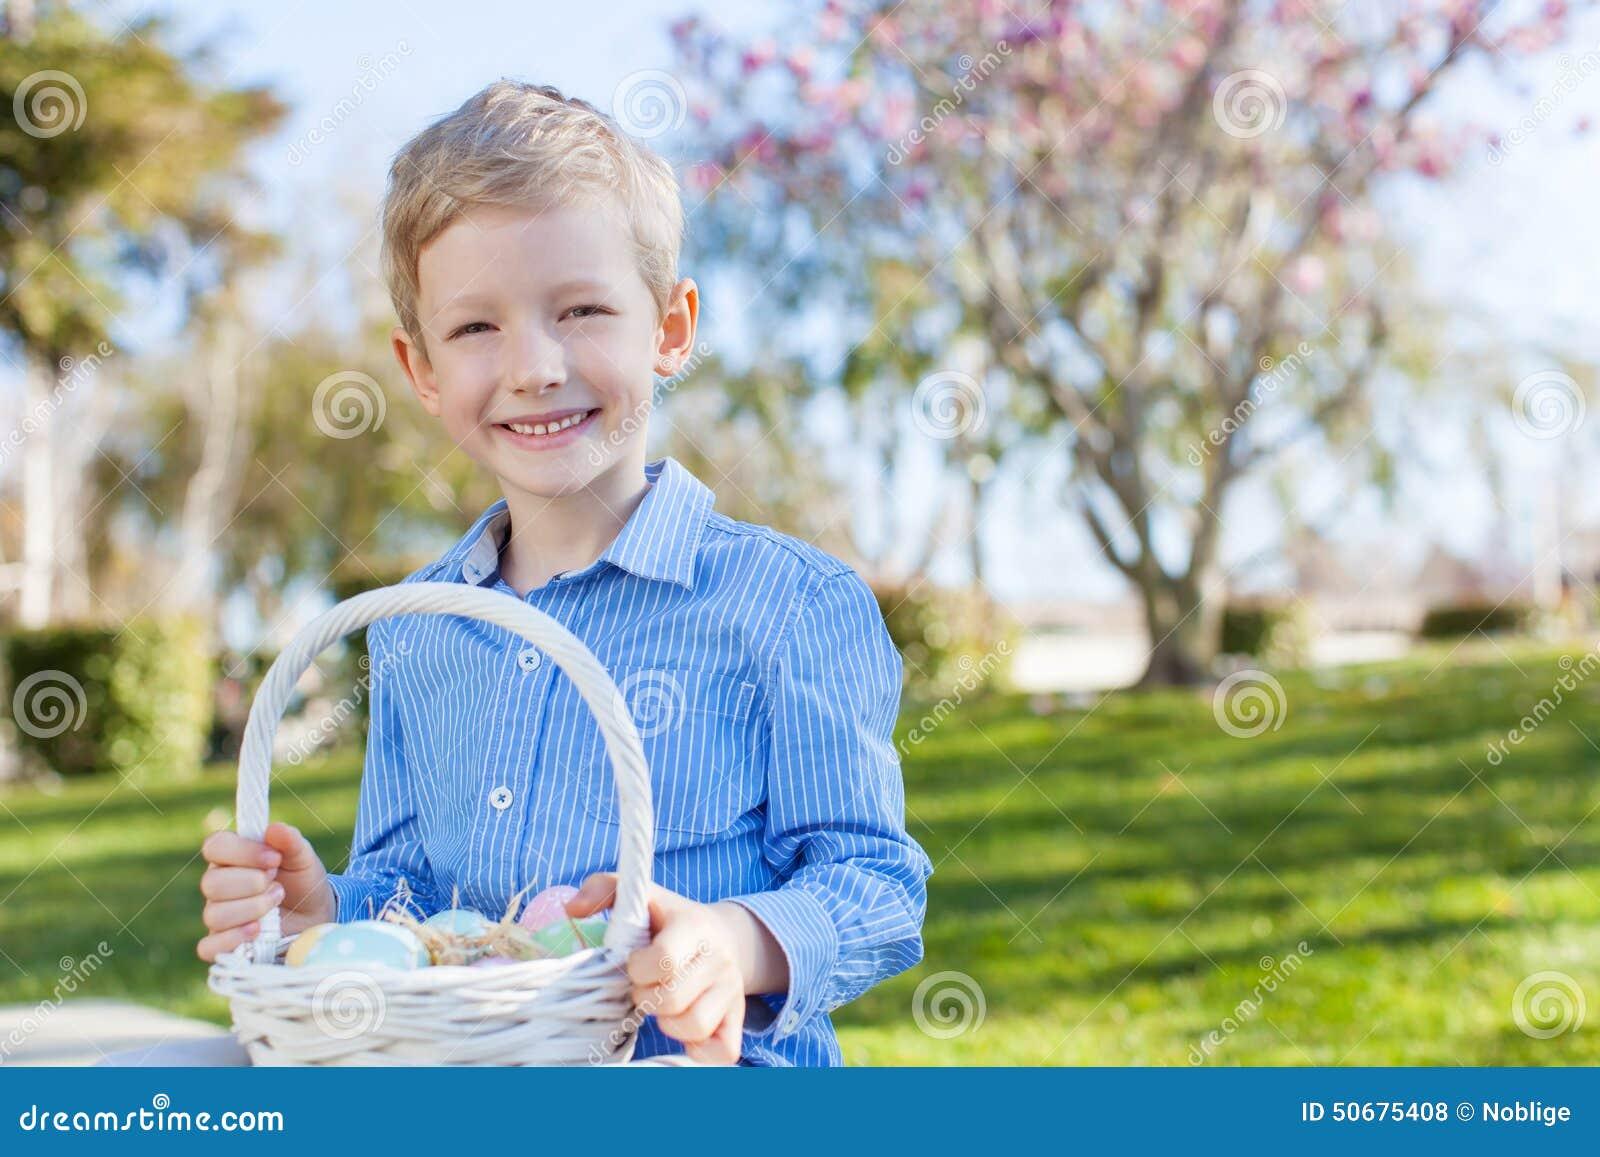 Download 复活节时间的男孩 库存照片. 图片 包括有 白种人, 系列, 五颜六色, 节假日, 逗人喜爱, 愉快, 水平 - 50675408